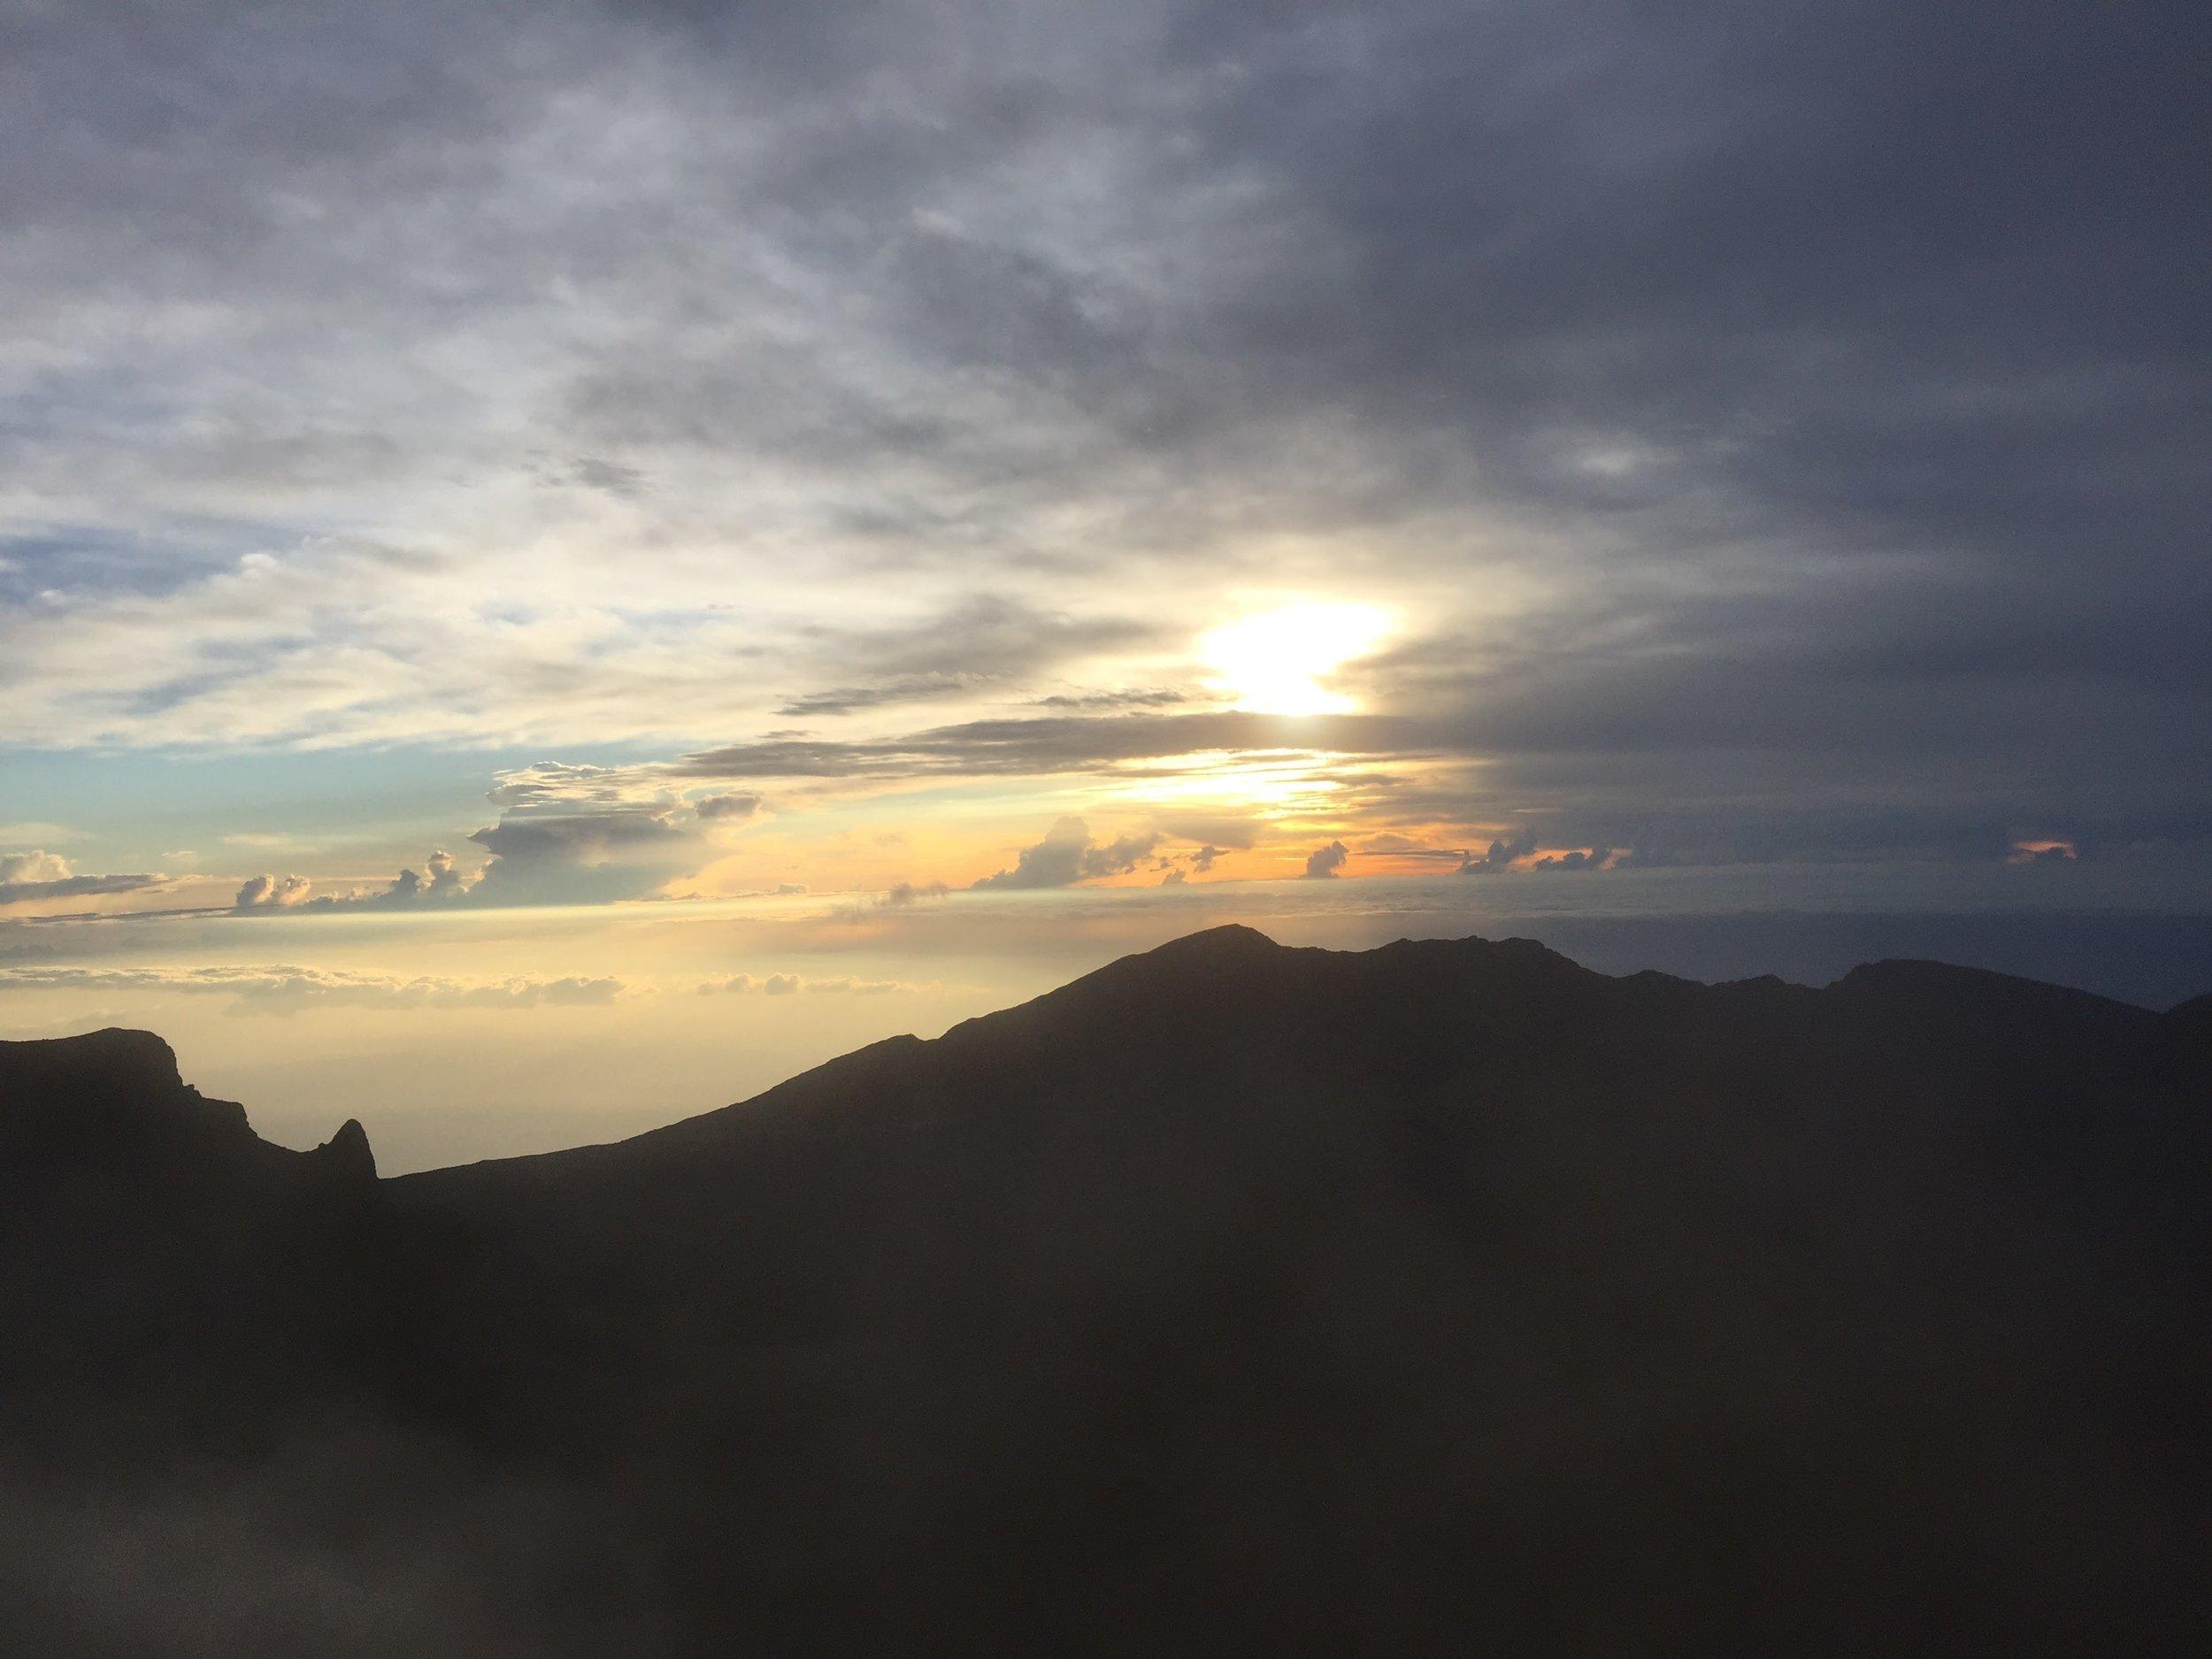 Sunrise at 10,000 feet, Maui